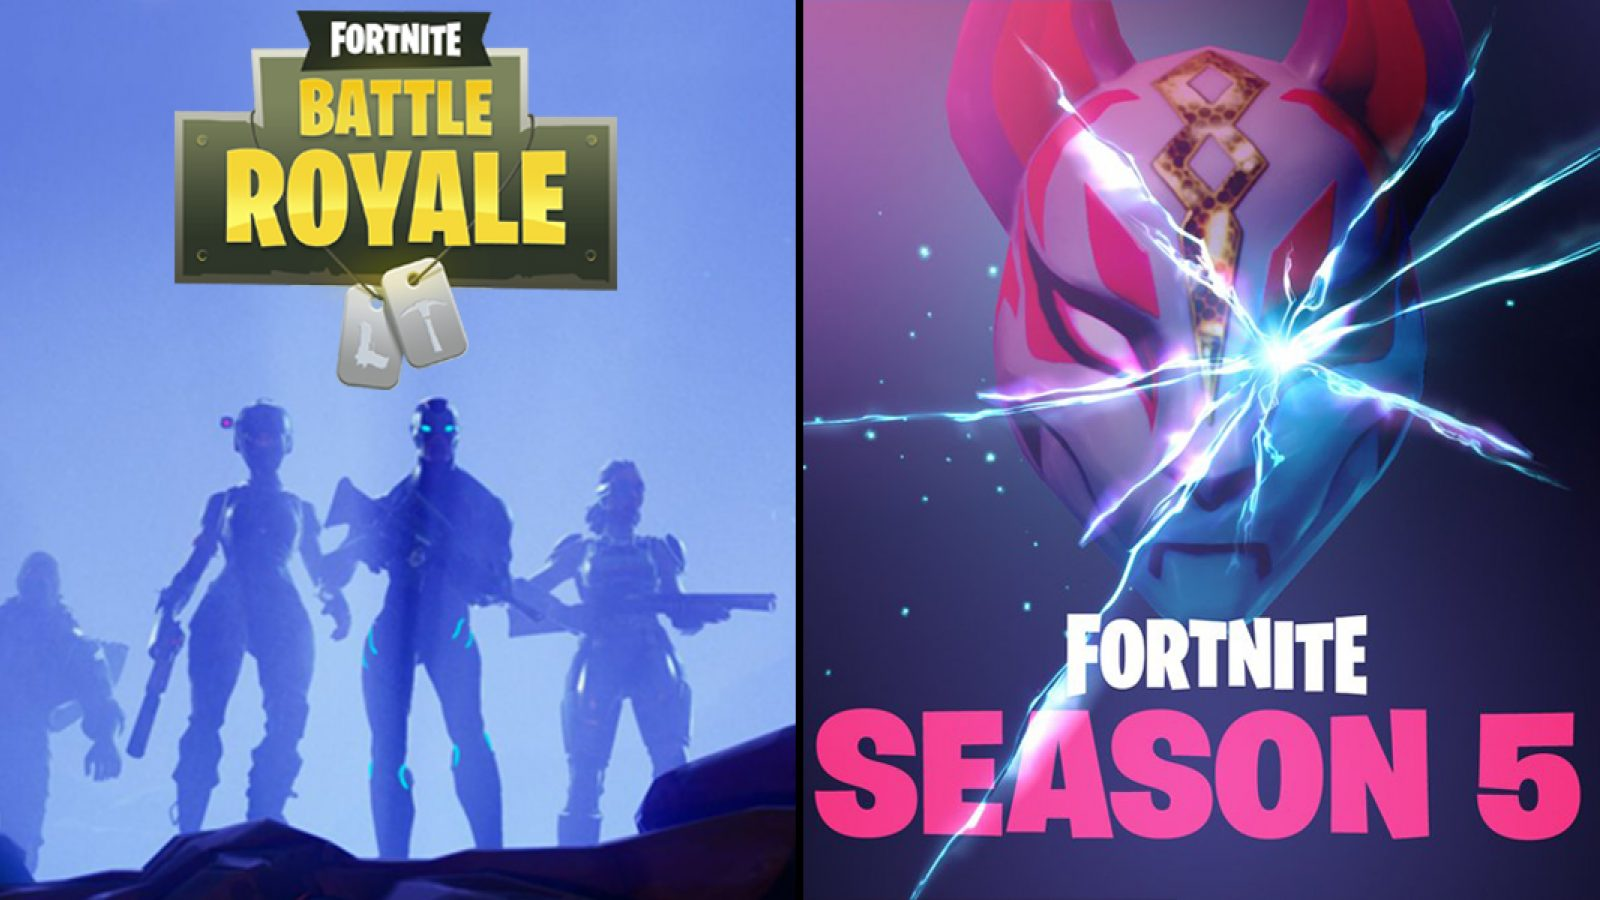 When does fortnite battle royale season 5 come out